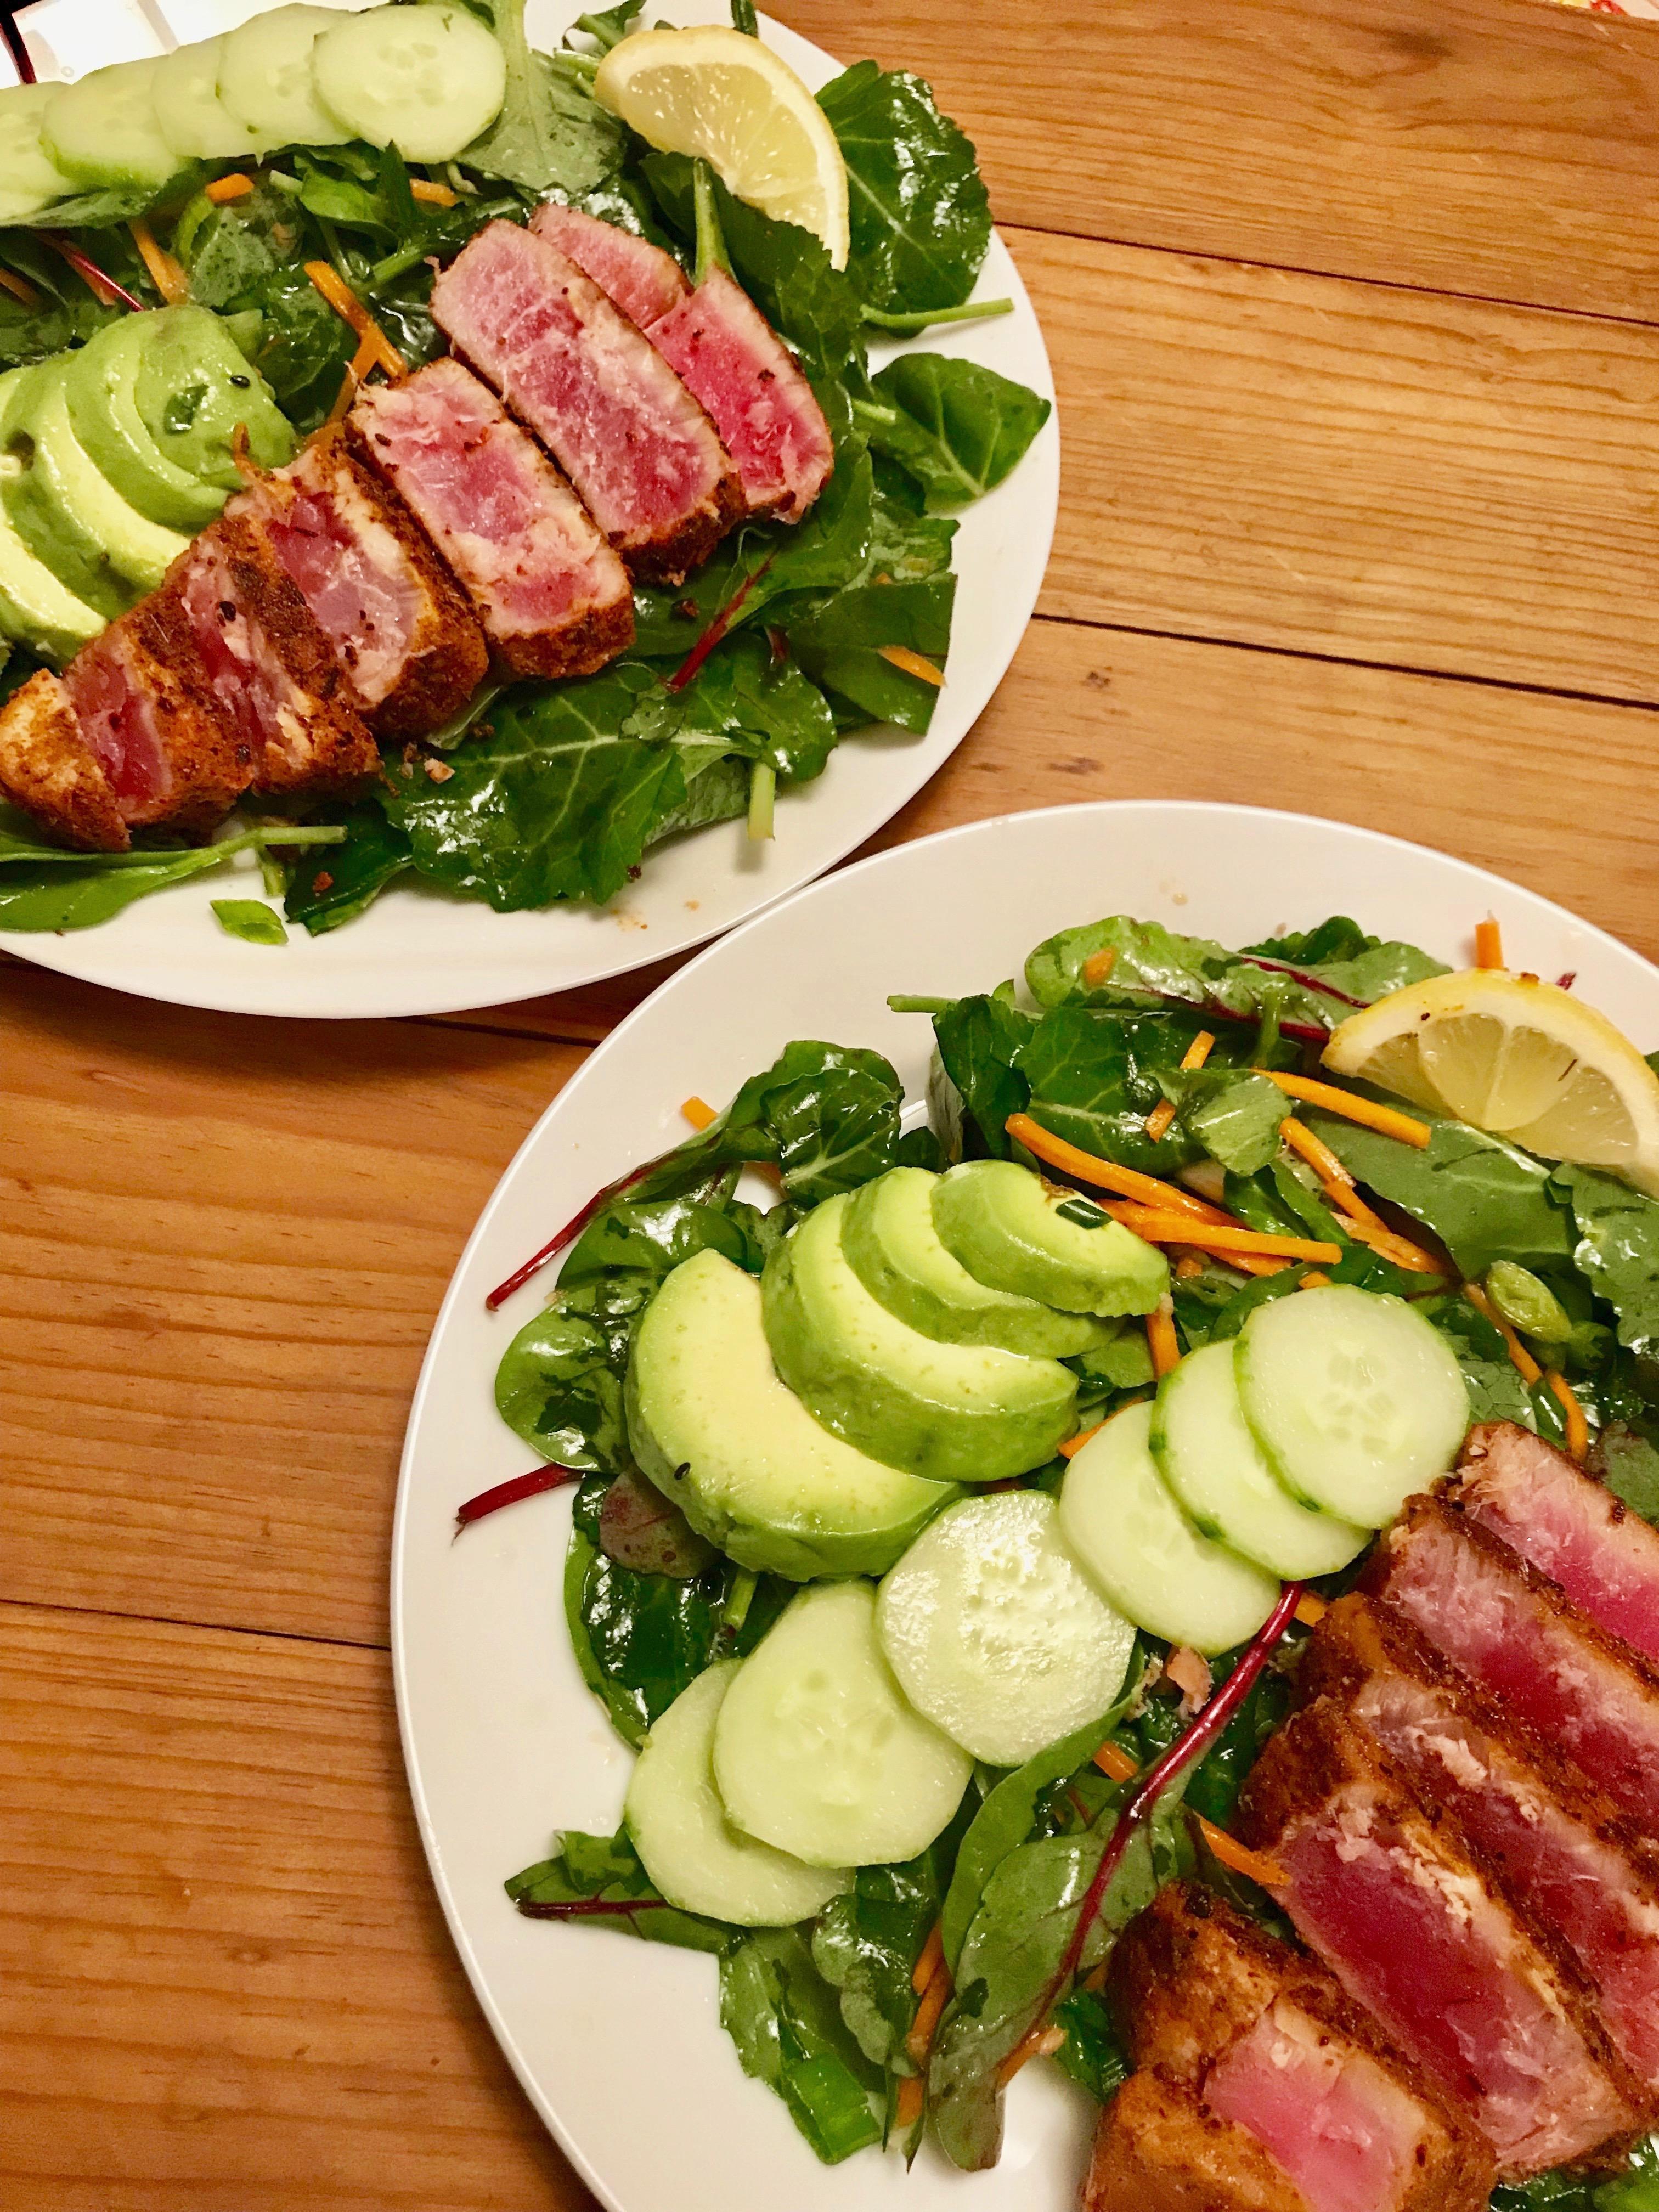 Ahi Tuna Salad with Sesame Soy Vinaigrette